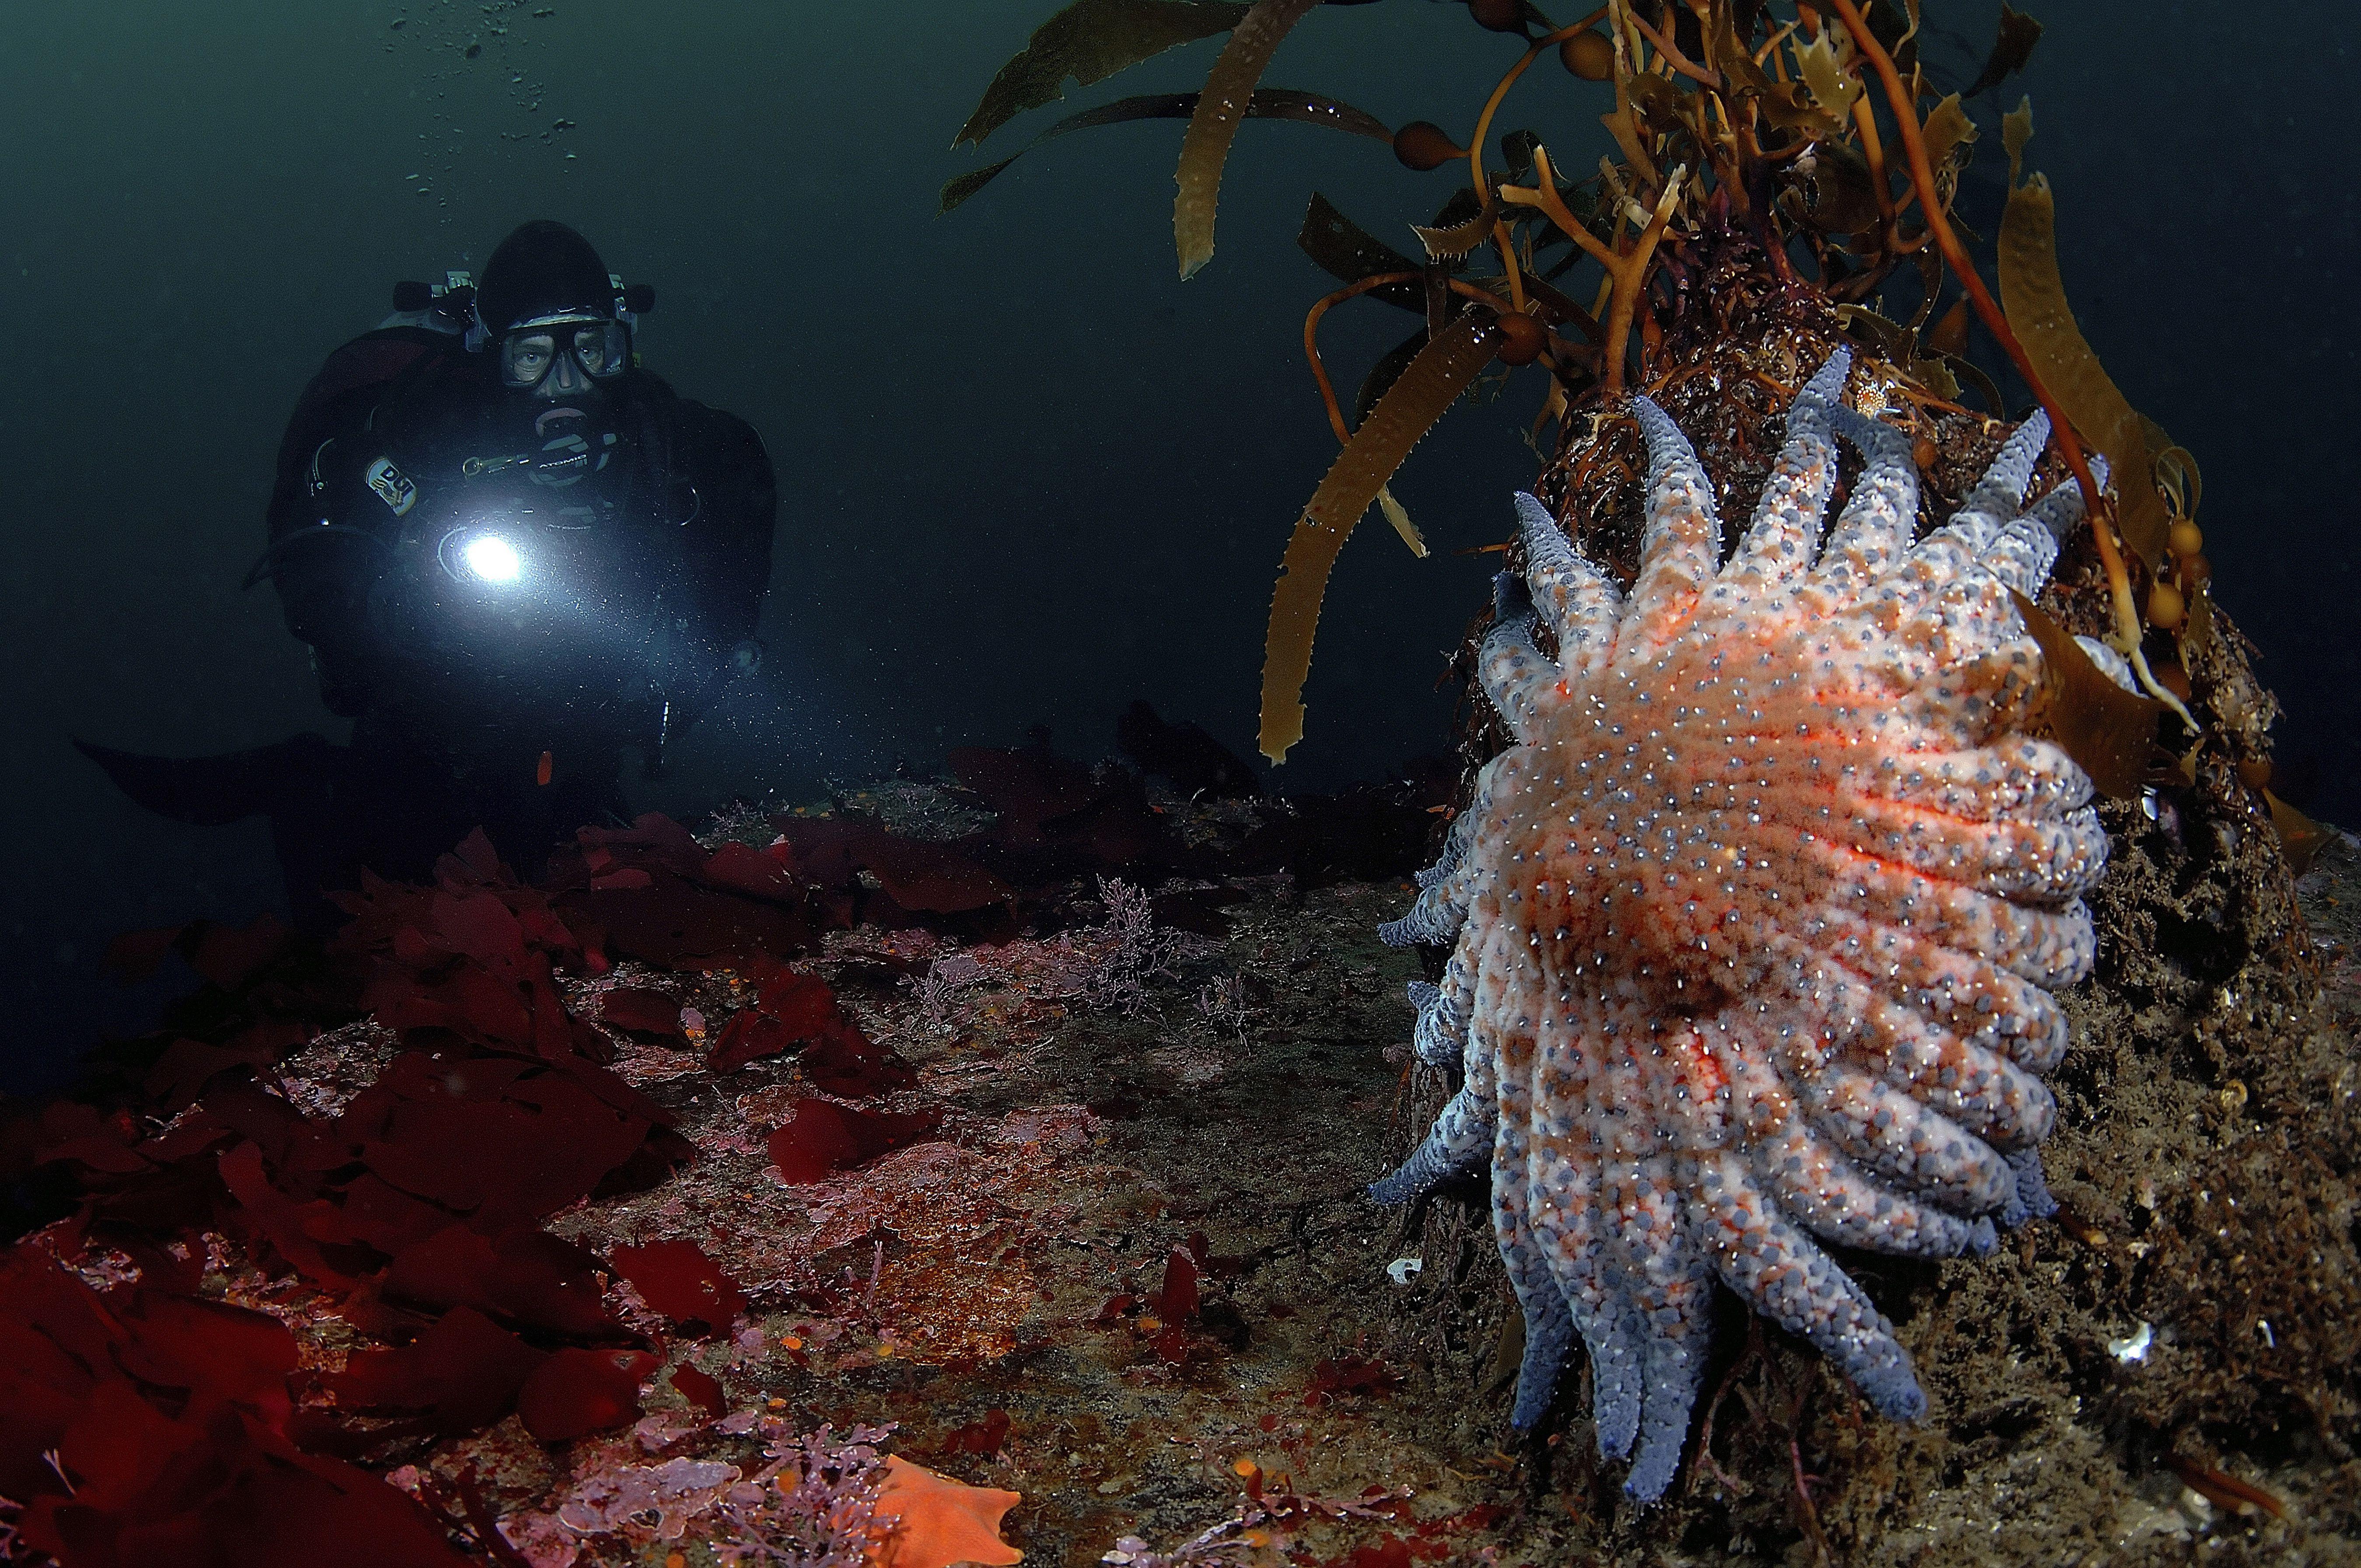 Diver and Sun Star, Crossaster sp., Monterey Bay, California, USA